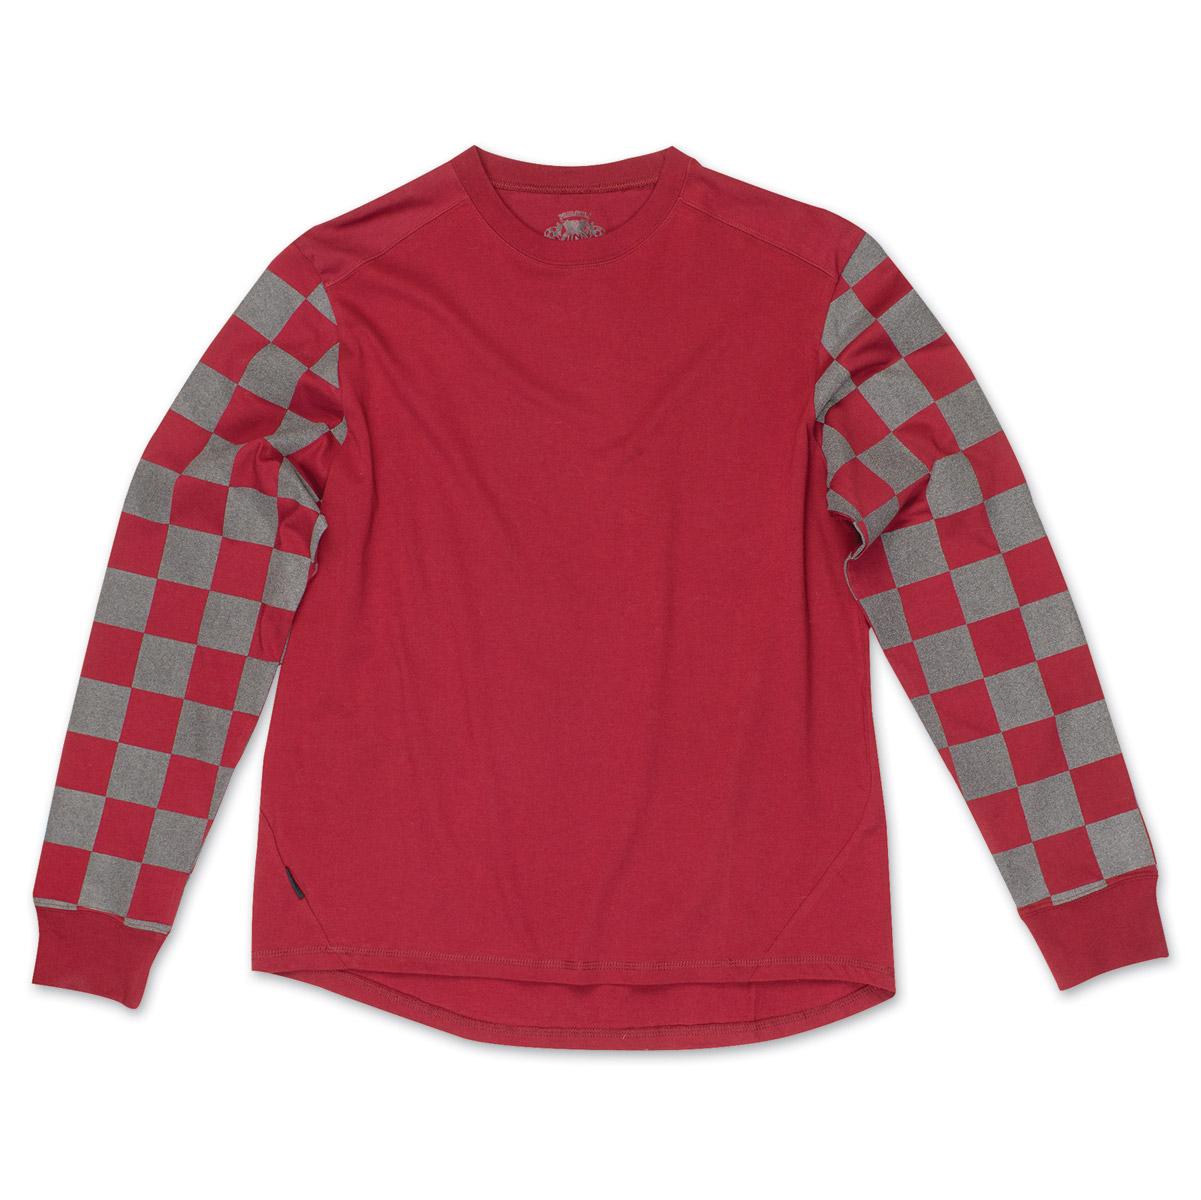 Roland Sands Design Men's Hangtown Reflective Oxblood/Black Long Sleeve T-Shirt